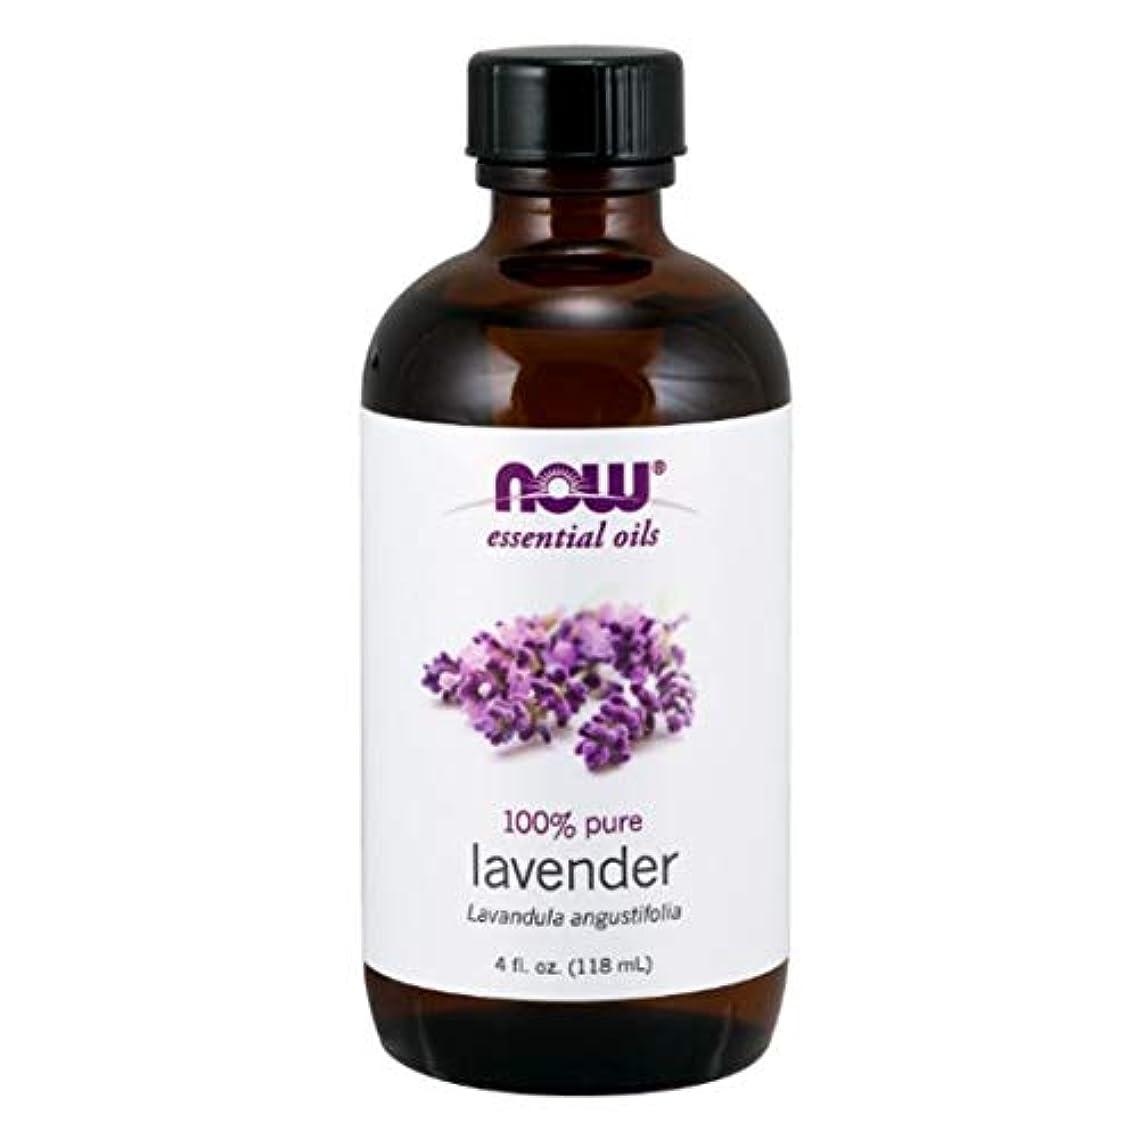 Now - Lavender Oil 100% Pure 4 oz (118 ml) [並行輸入品]